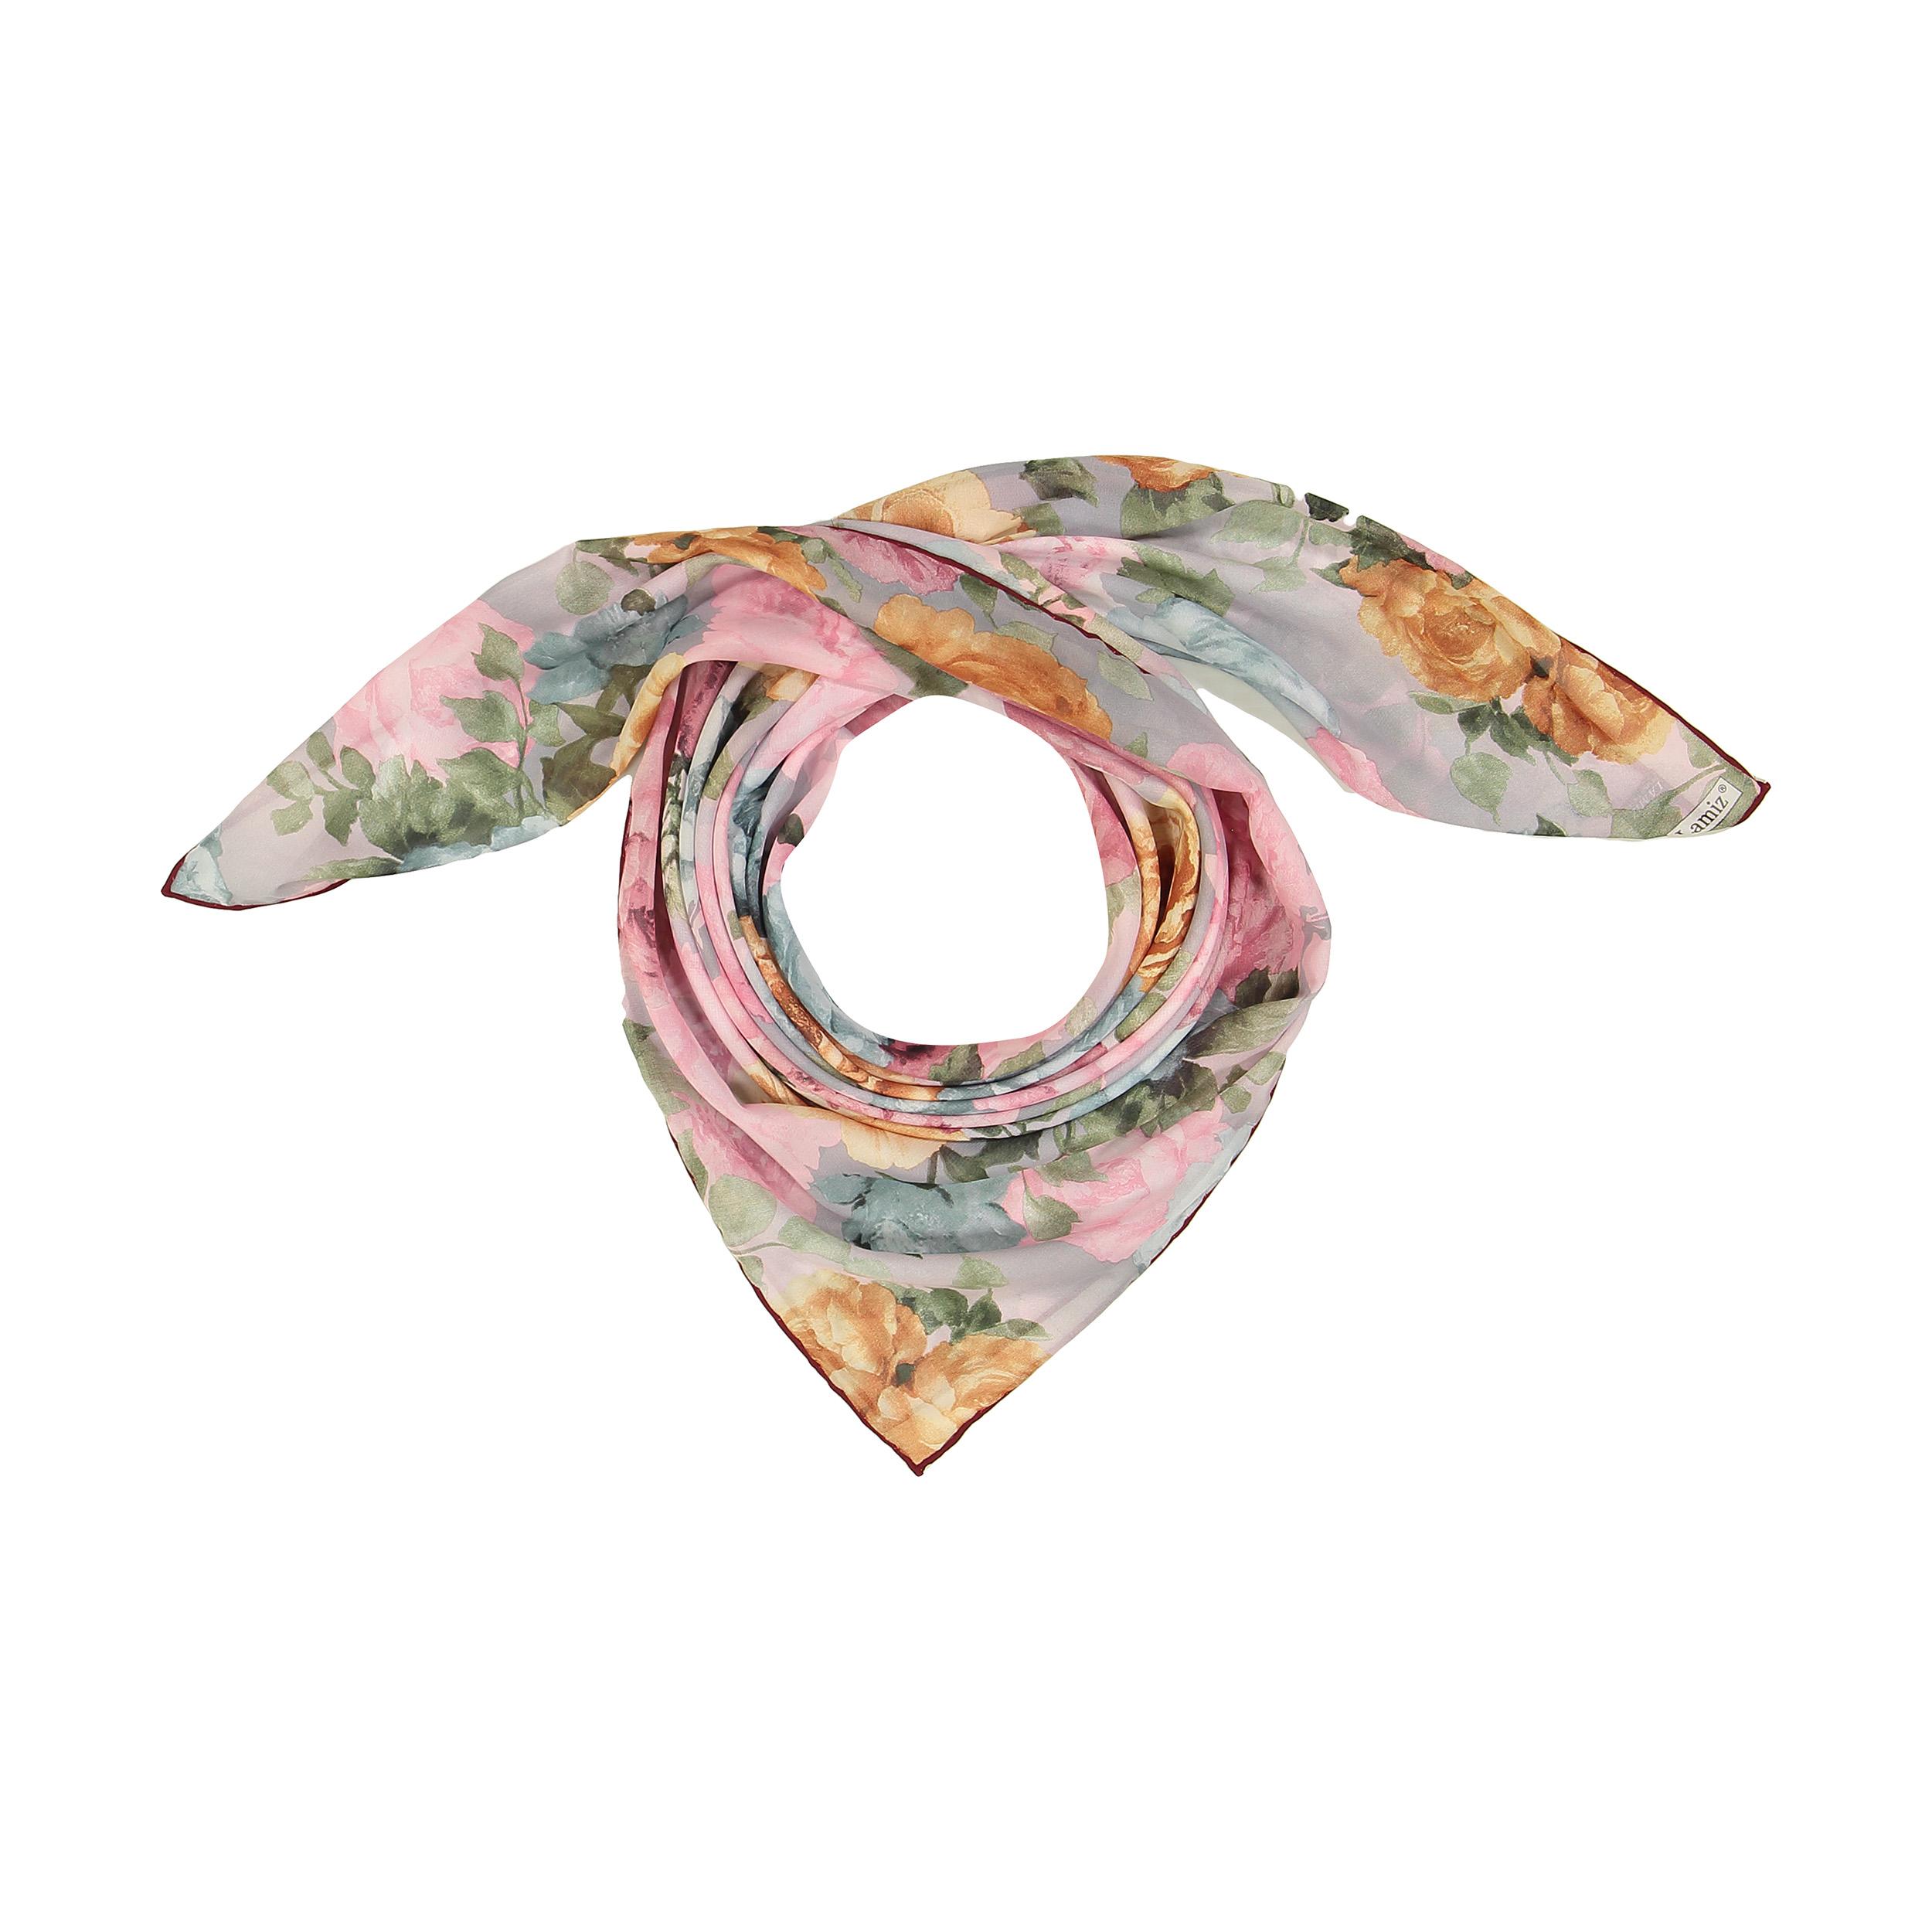 روسری زنانه لمیز طرح گلستان کد 352